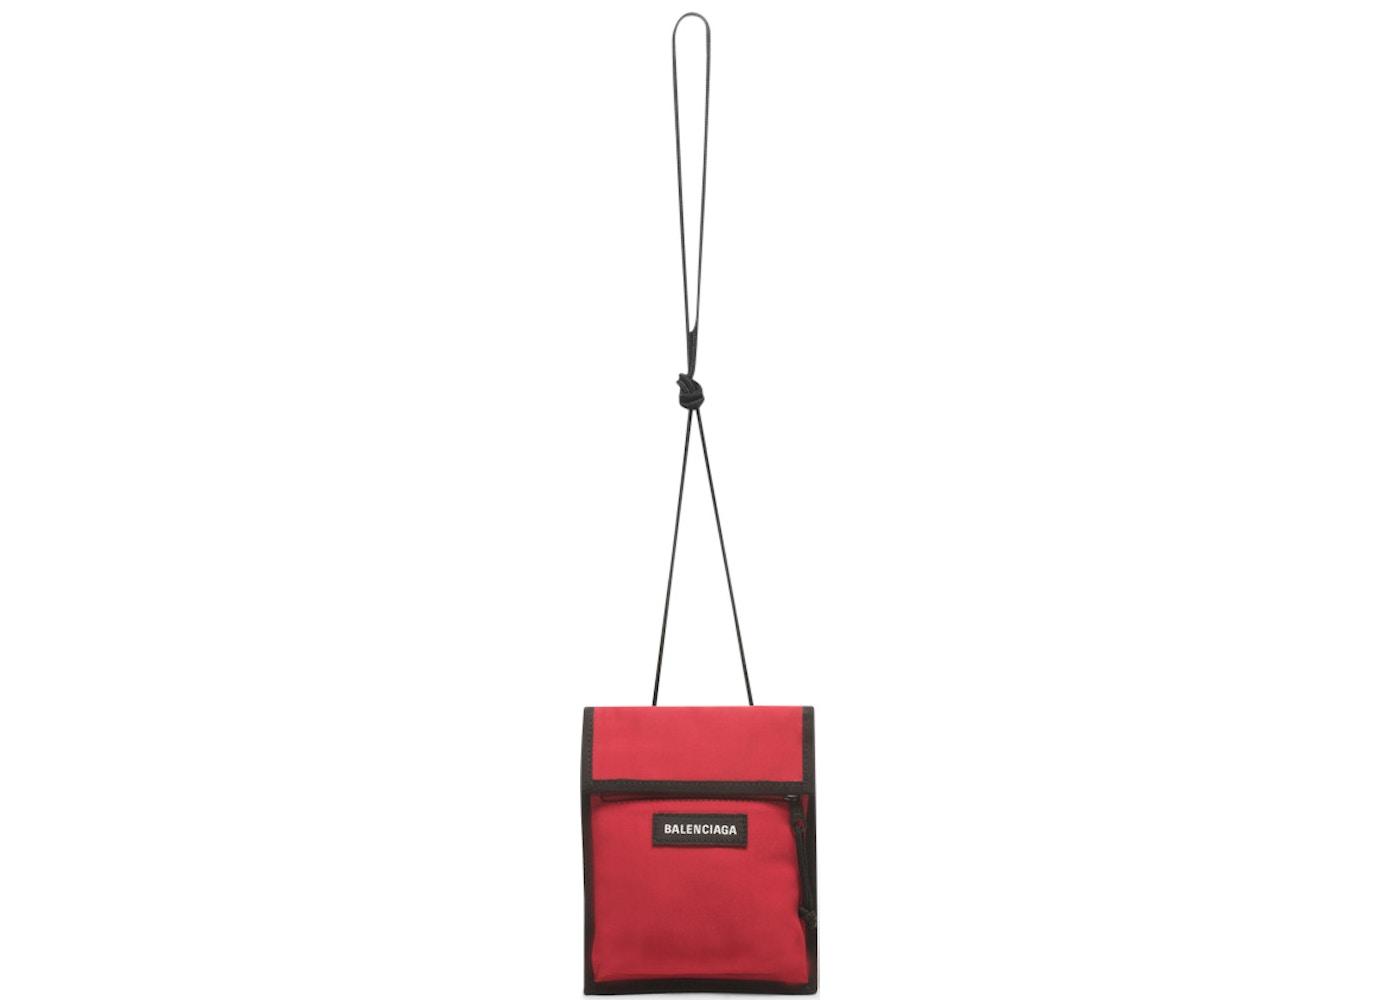 32a0ecd1d9 Balenciaga Explorer Pouch Strap Small Red/Black